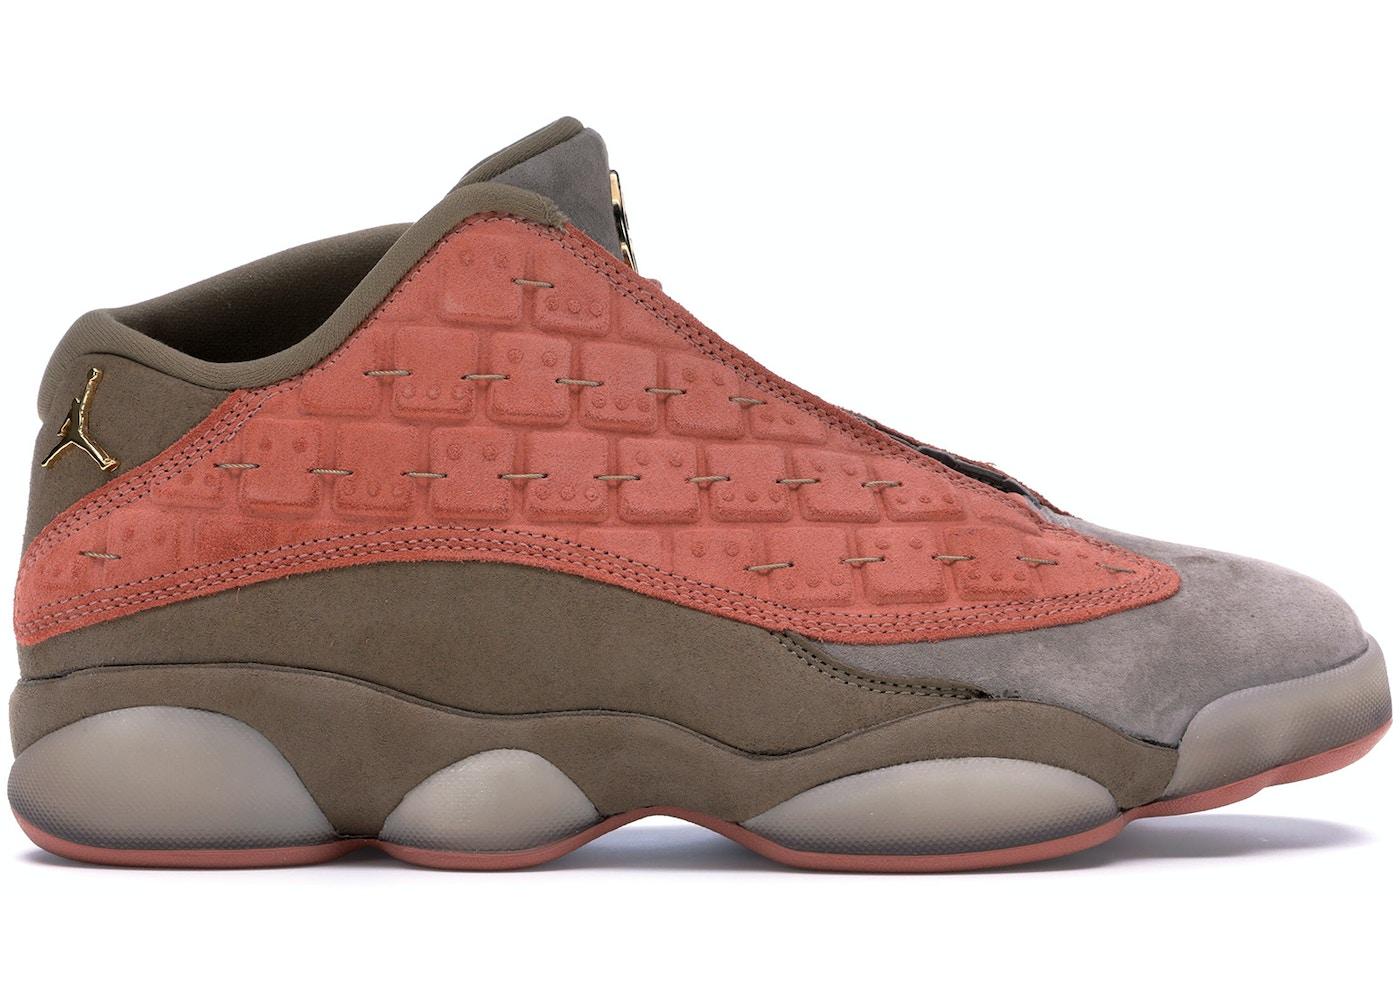 cheap for discount 16a10 28b93 Buy Air Jordan 13 Shoes & Deadstock Sneakers